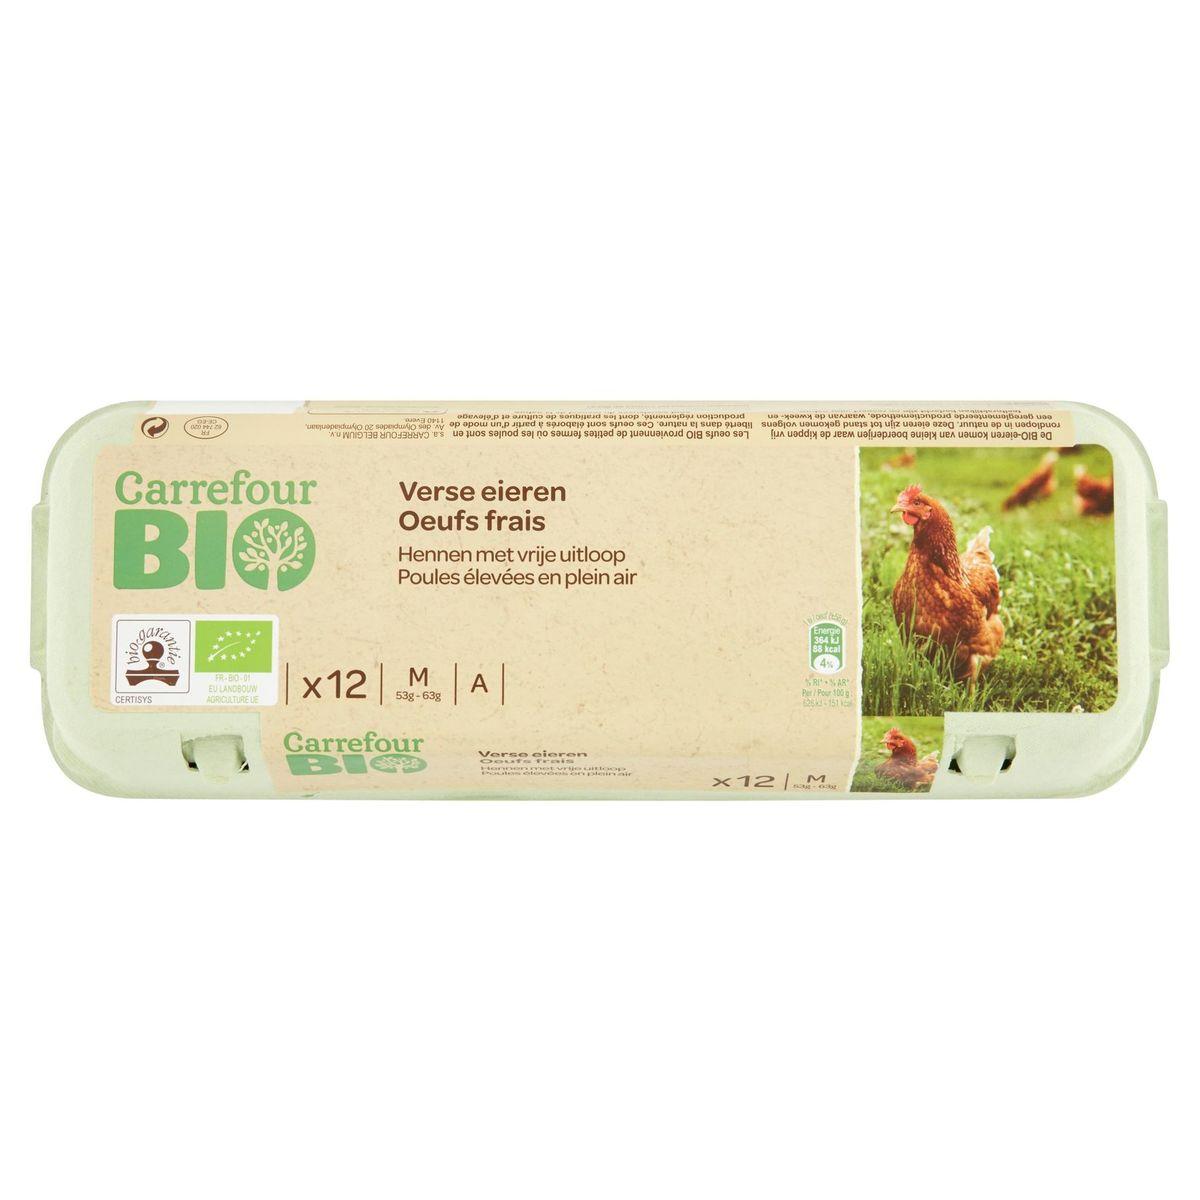 Carrefour Bio 12 Verse Eieren M